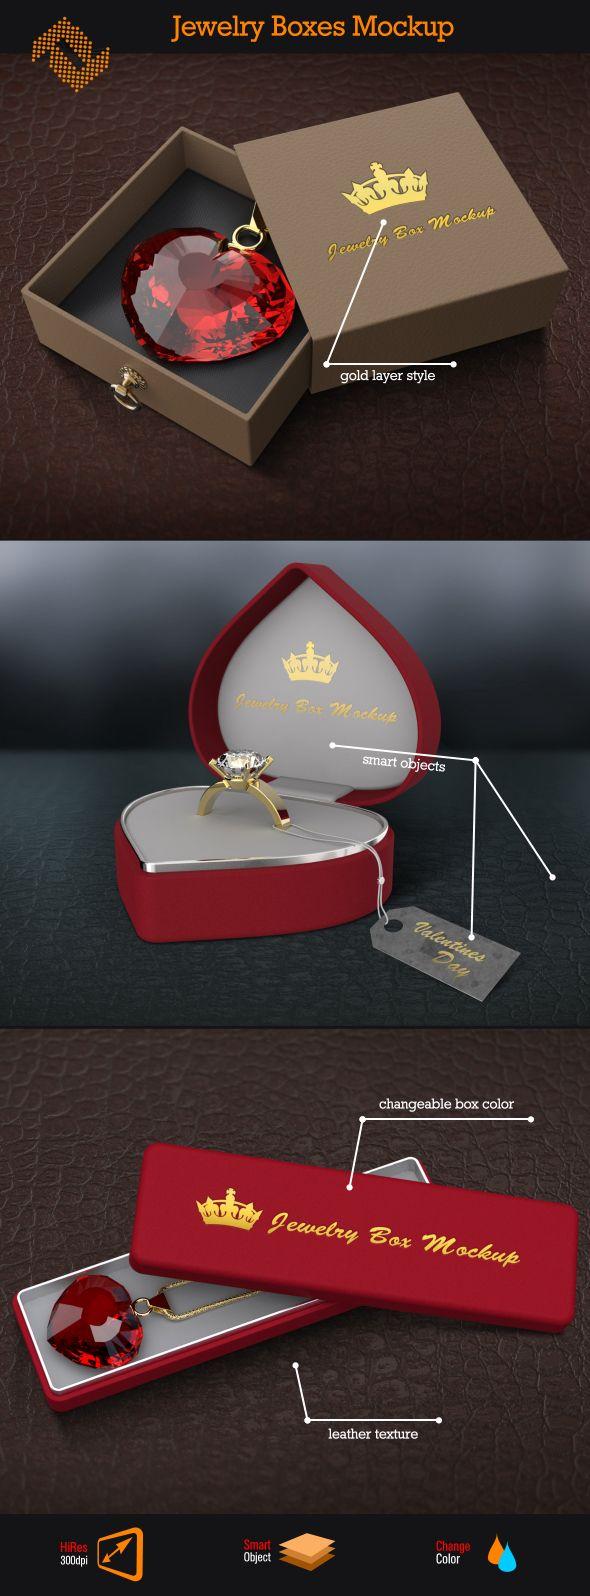 Download Jewelry Box Mockup Http Graphicriver Net Item Jewelry Box Logo Mockup 10068010 Ref Fusinhorn Werbemittel Produkt Visualisierung